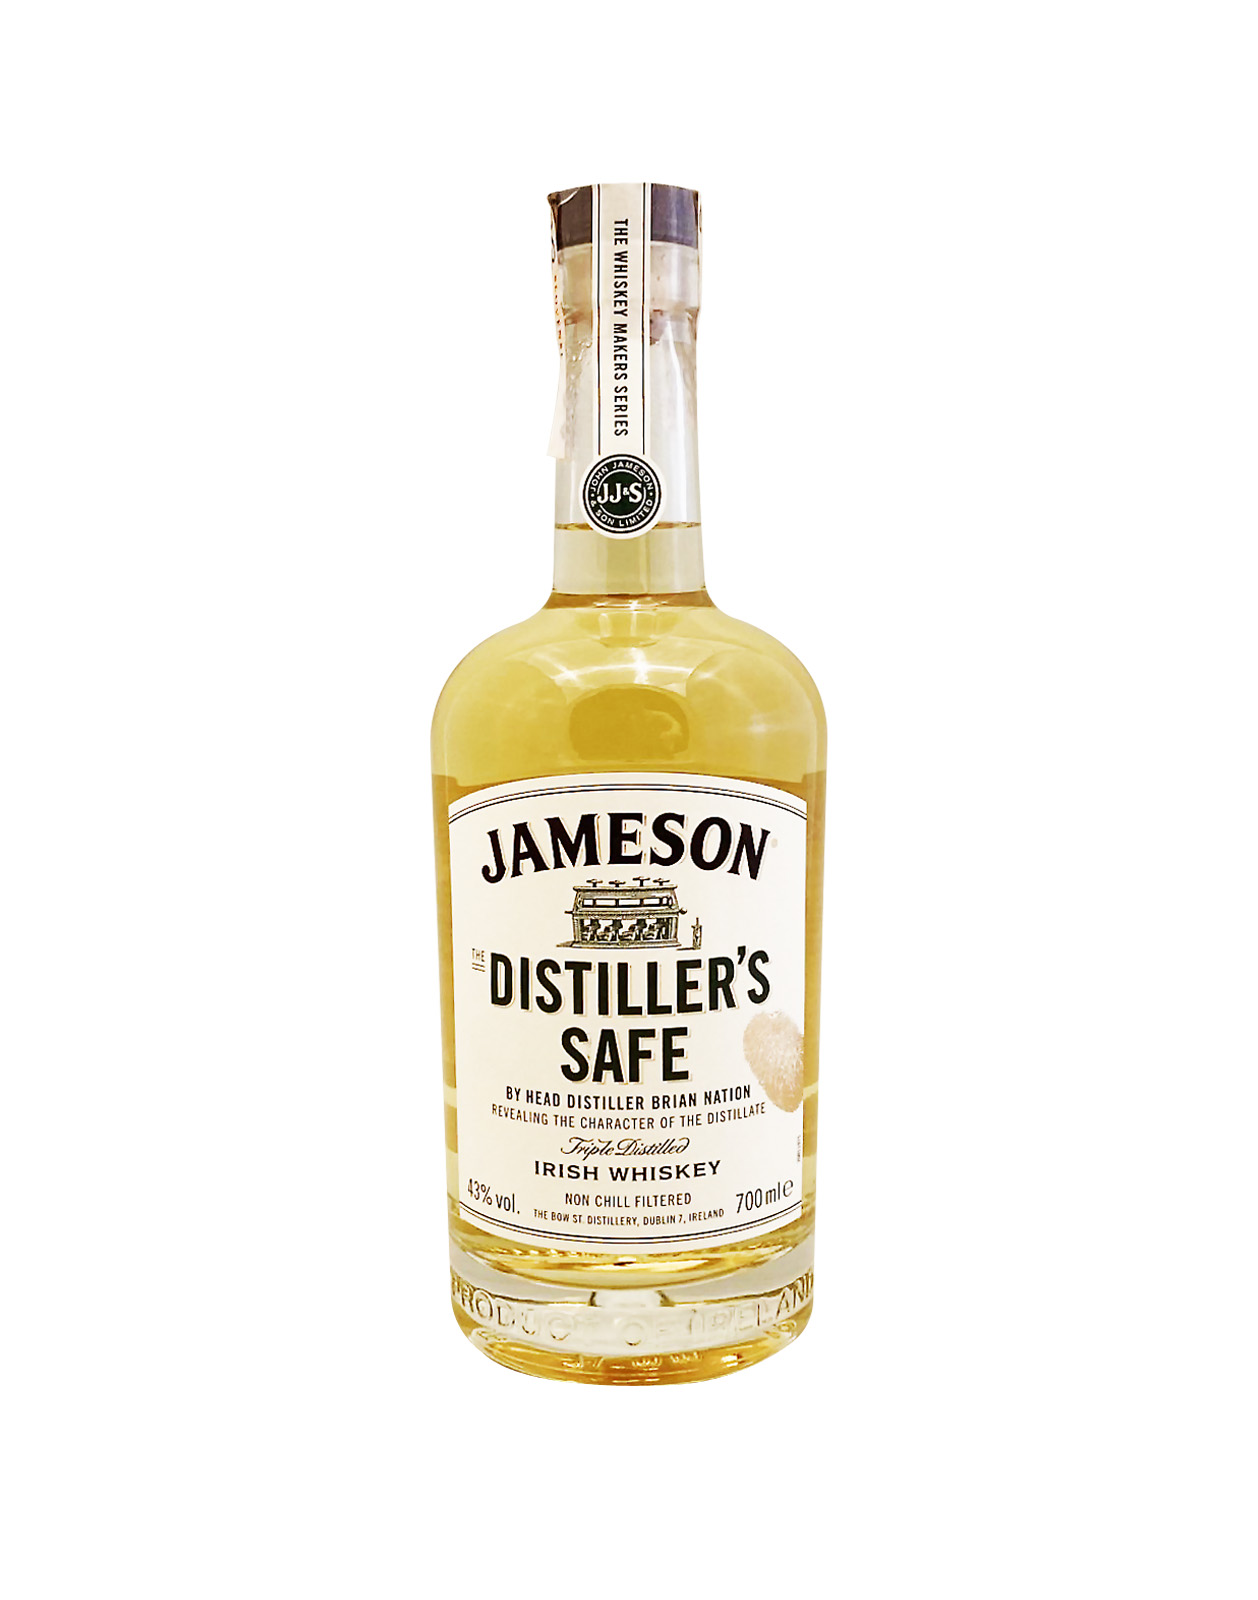 Jameson Makers Distillers Safe 43%, Bottleshop Sunny wines slnecnice mesto, petrzalka, Írska Whiskey, rozvoz alkoholu, eshop